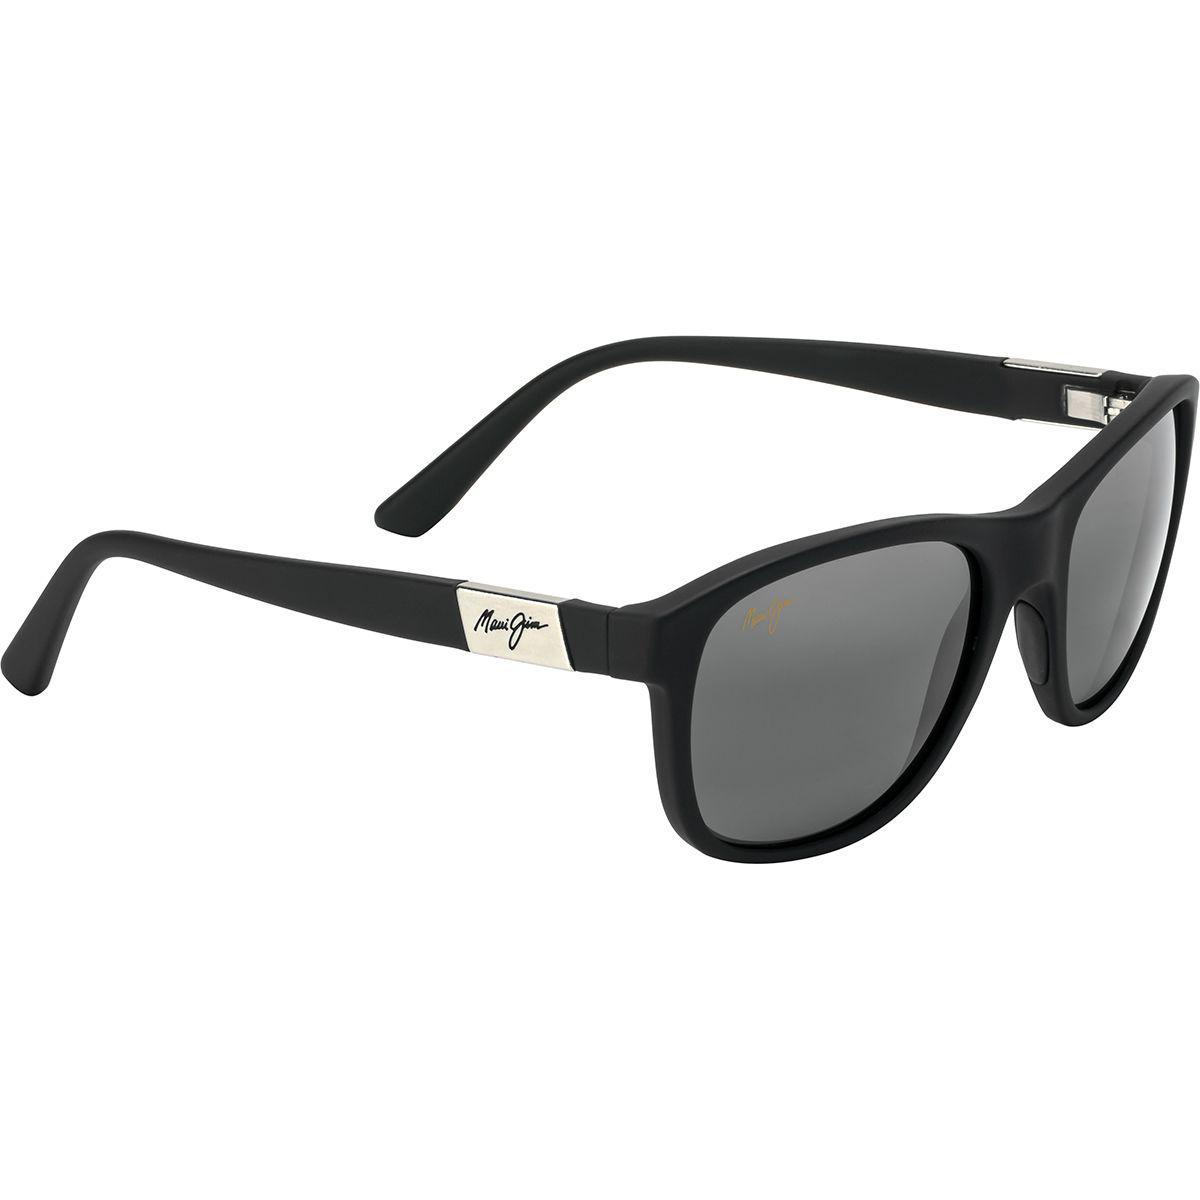 b145ce4d7ca Lyst - Maui Jim Wakea Sunglasses - Polarized in Black for Men